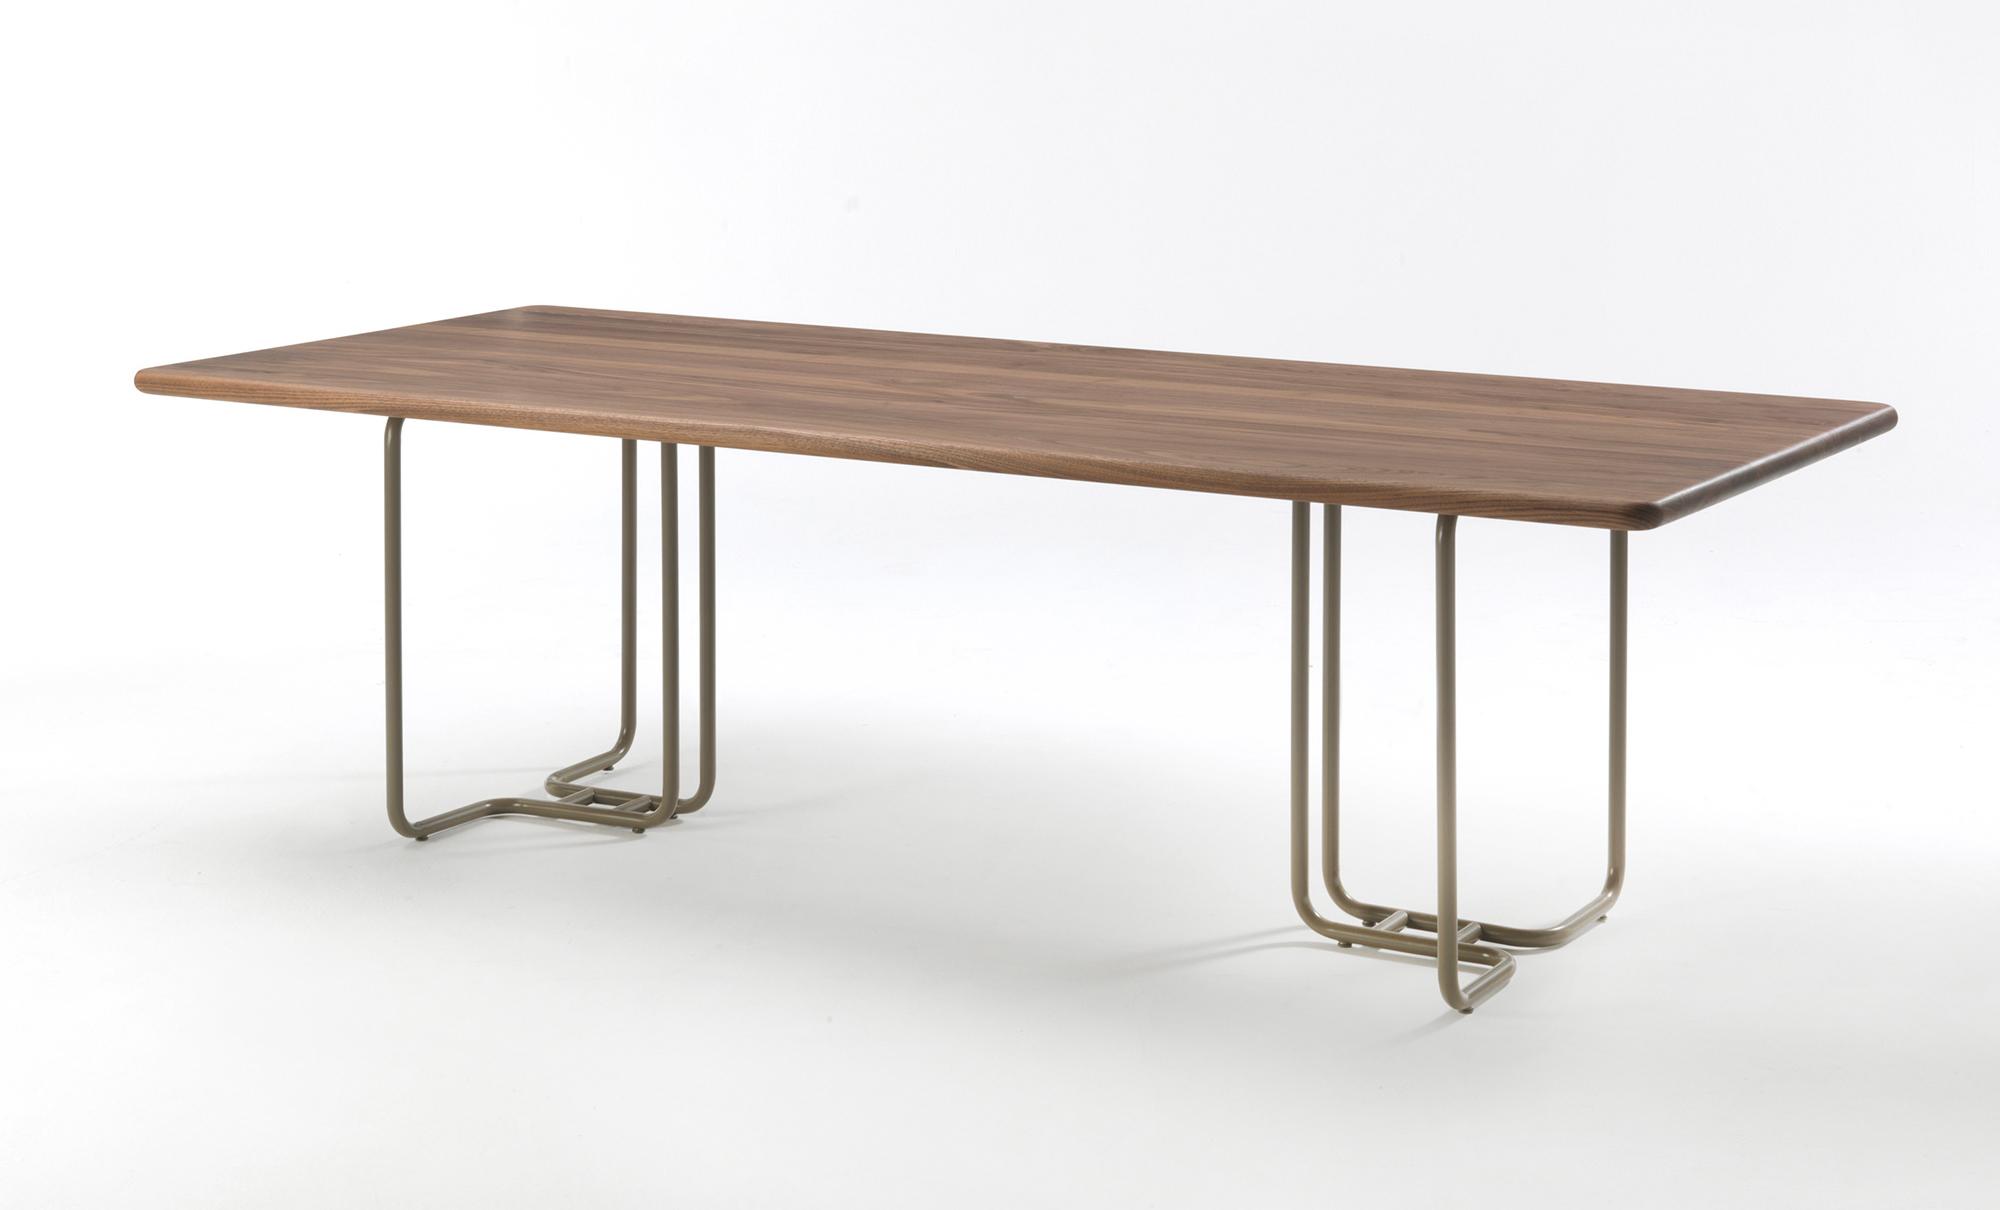 Tubular Dining Tables Fanuli Furniture